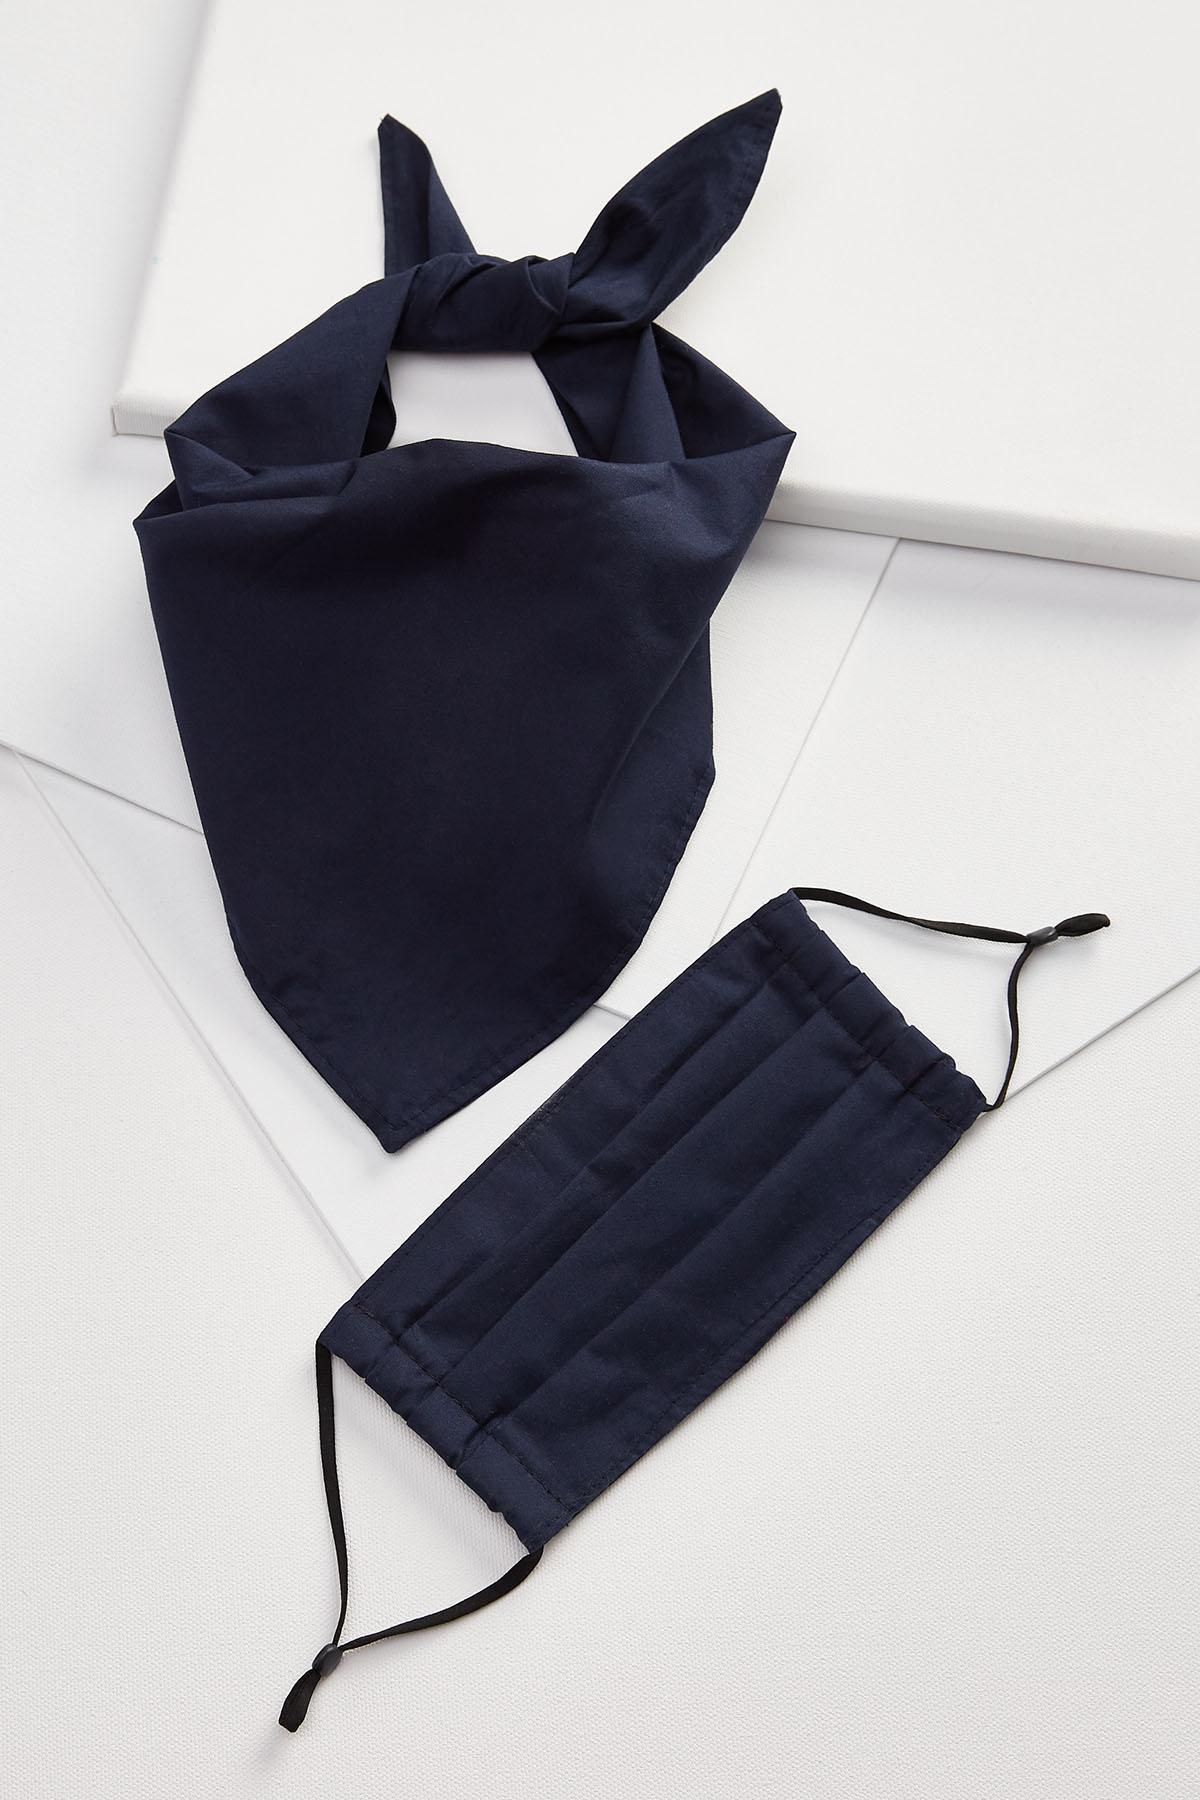 Small/Medium Navy Mask And Bandana Set